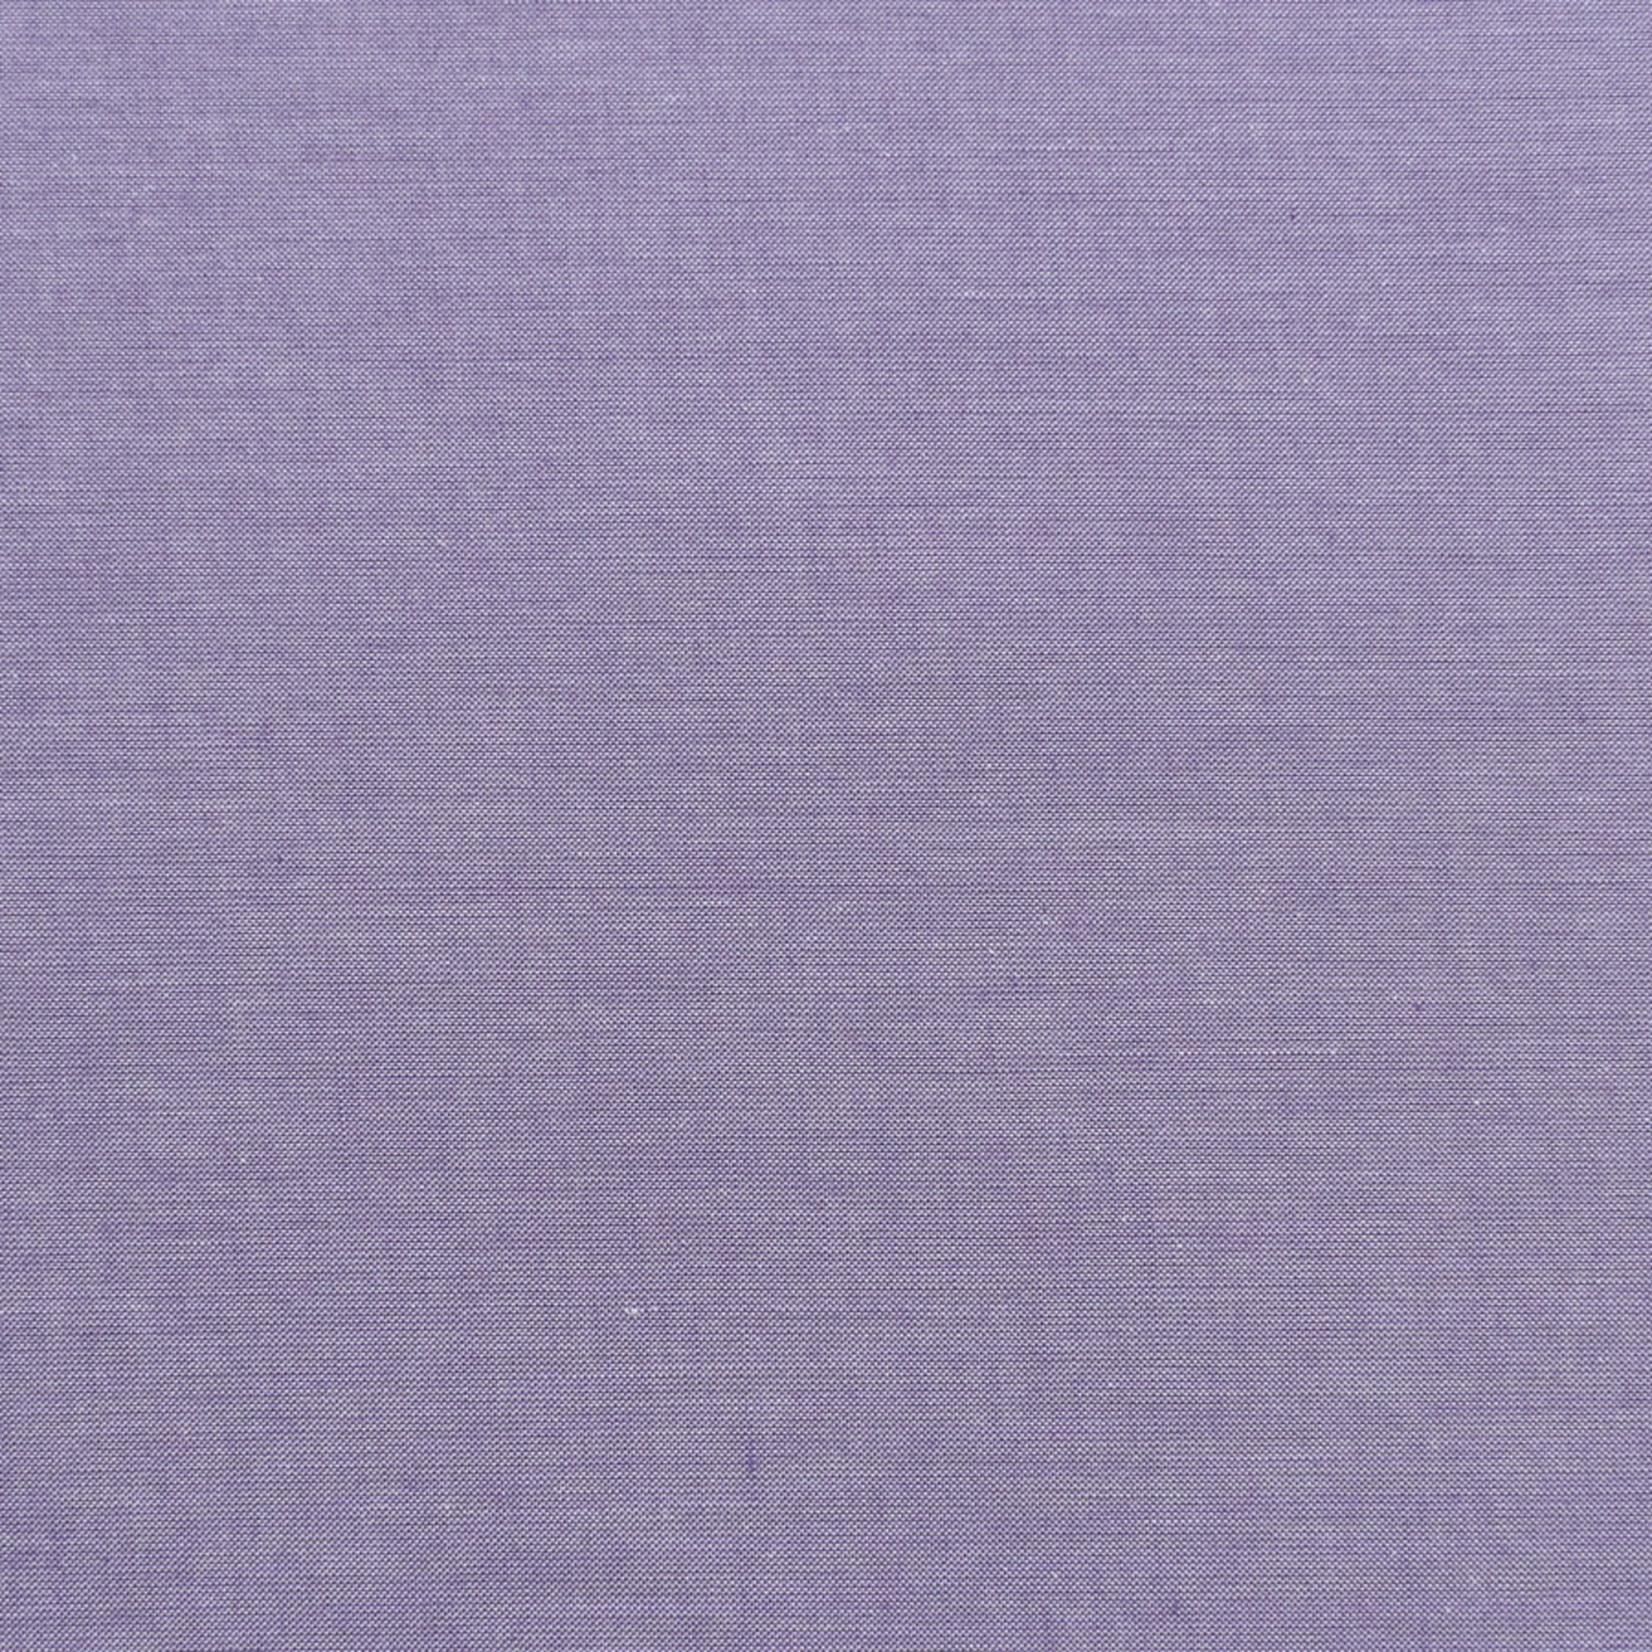 Tilda Tilda Basics, Chambray, Lavender 160009 $0.22 per cm or $22/m